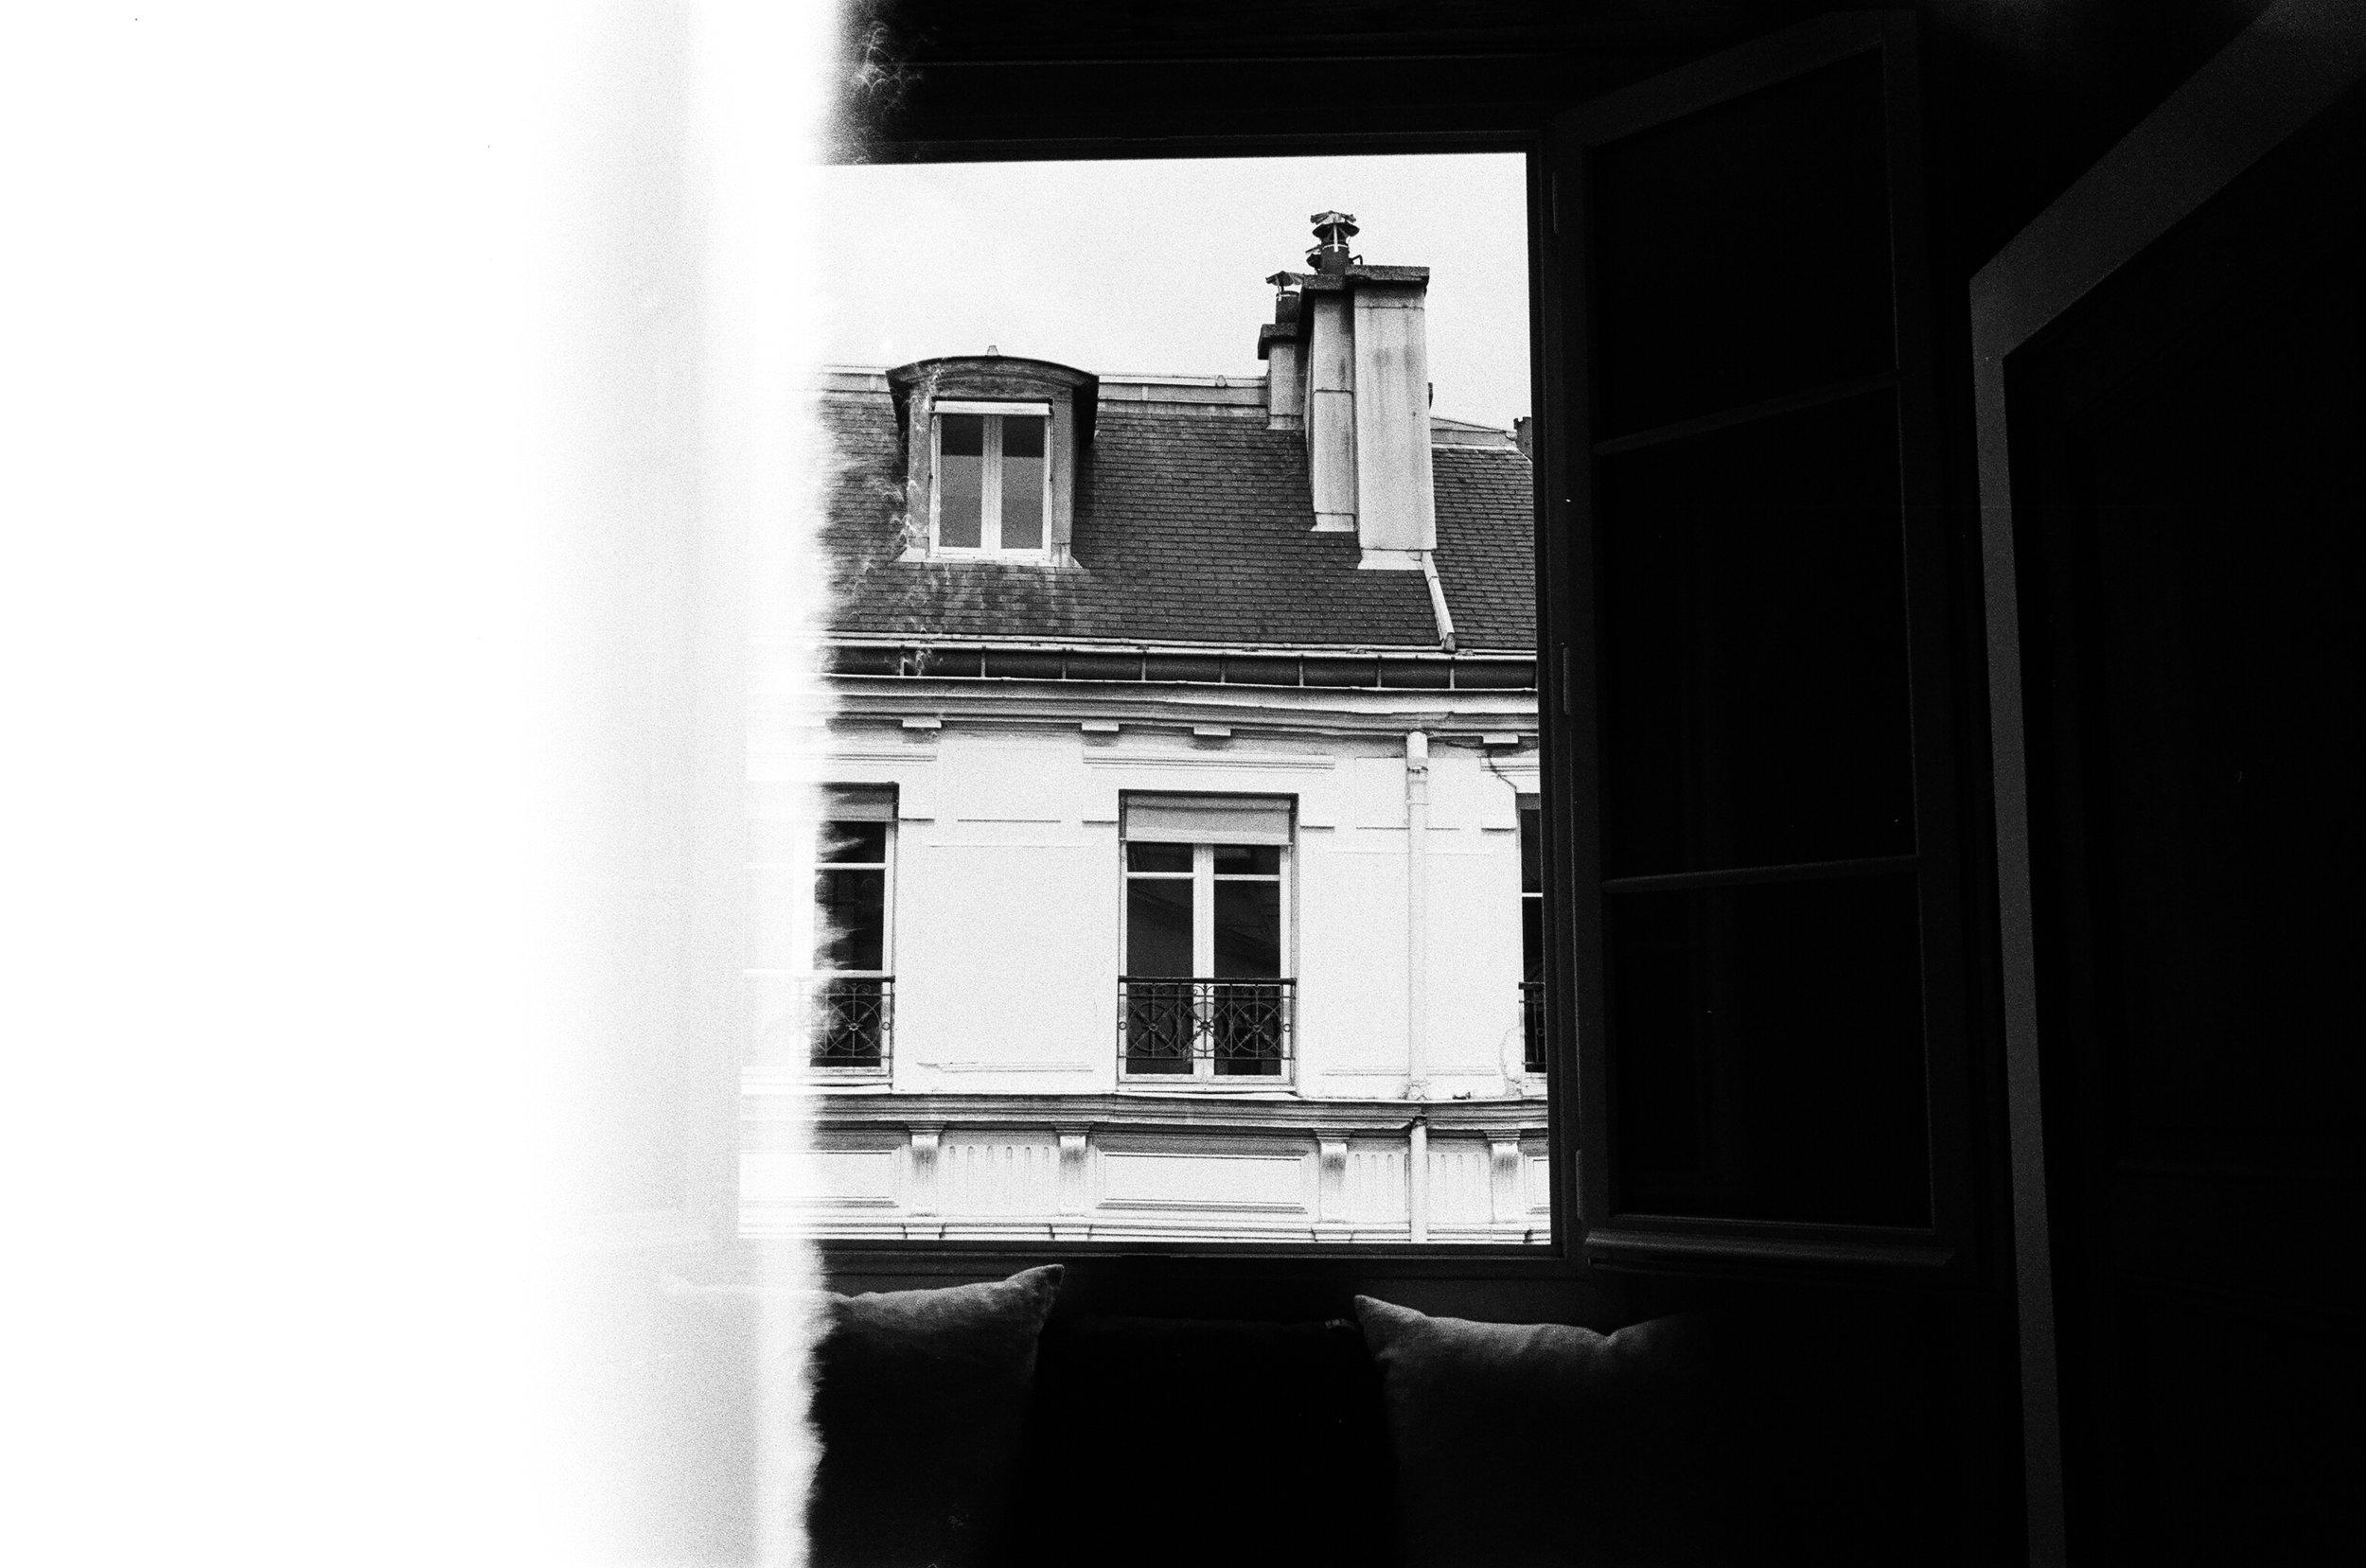 leica m6 film photography